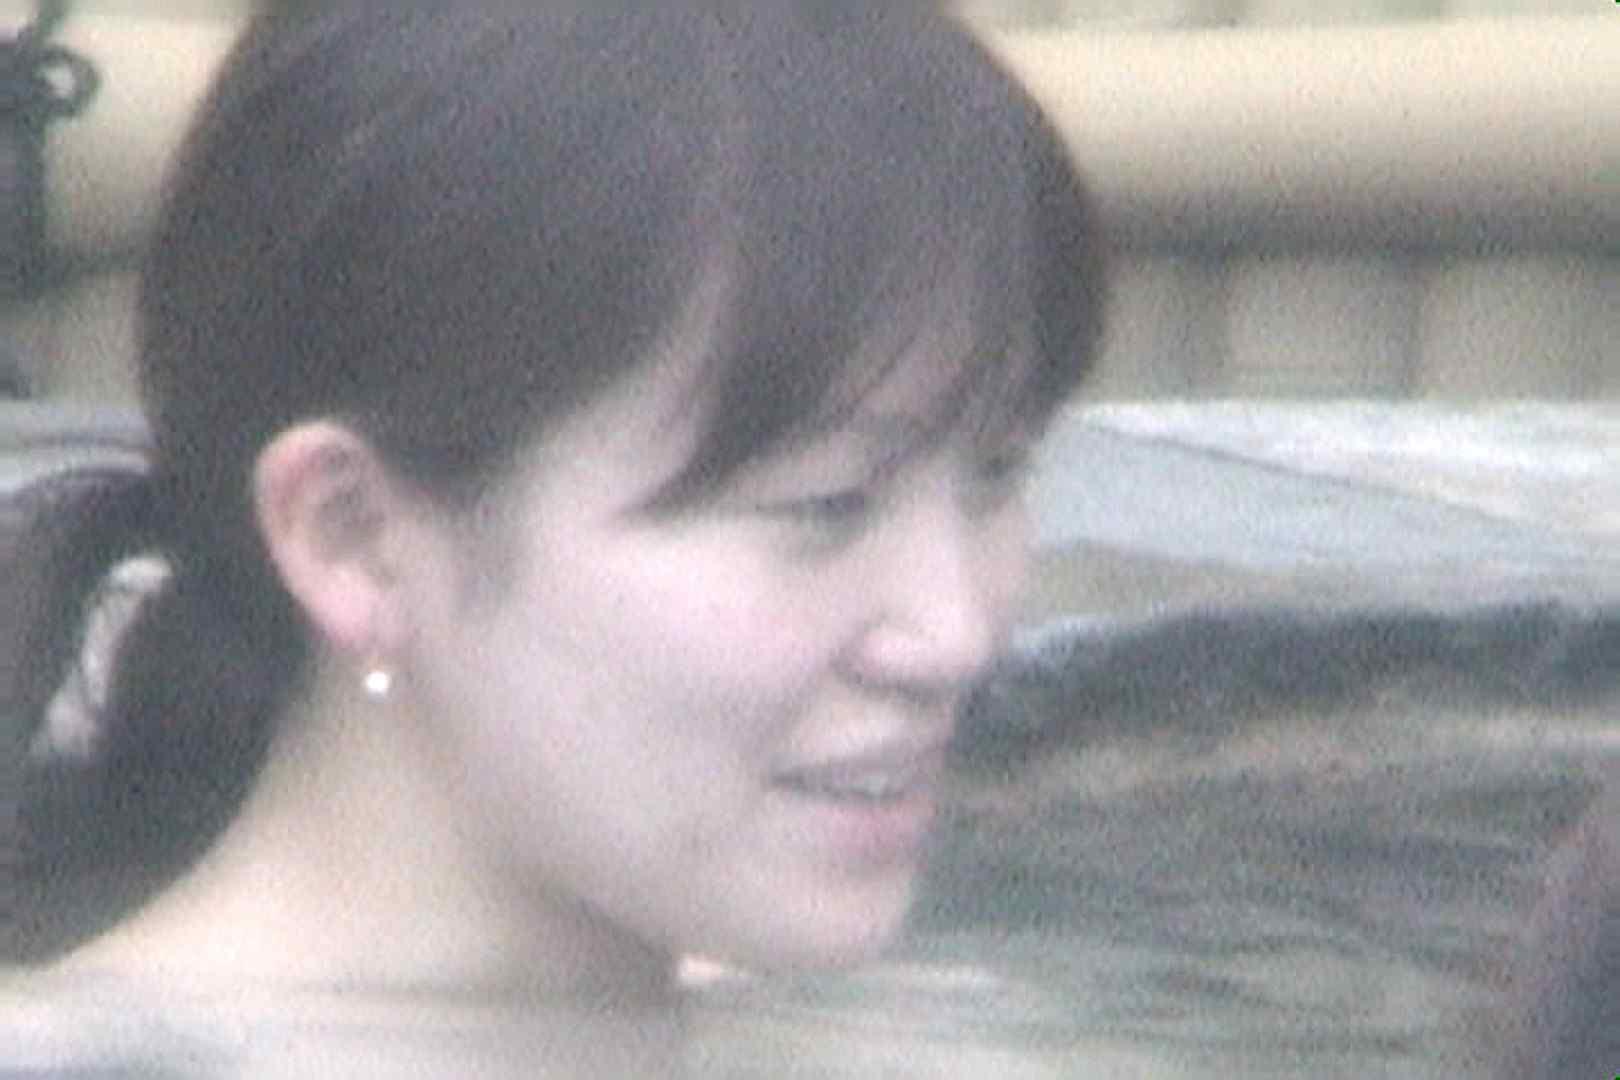 Aquaな露天風呂Vol.79【VIP限定】 盗撮 | HなOL  100pic 85